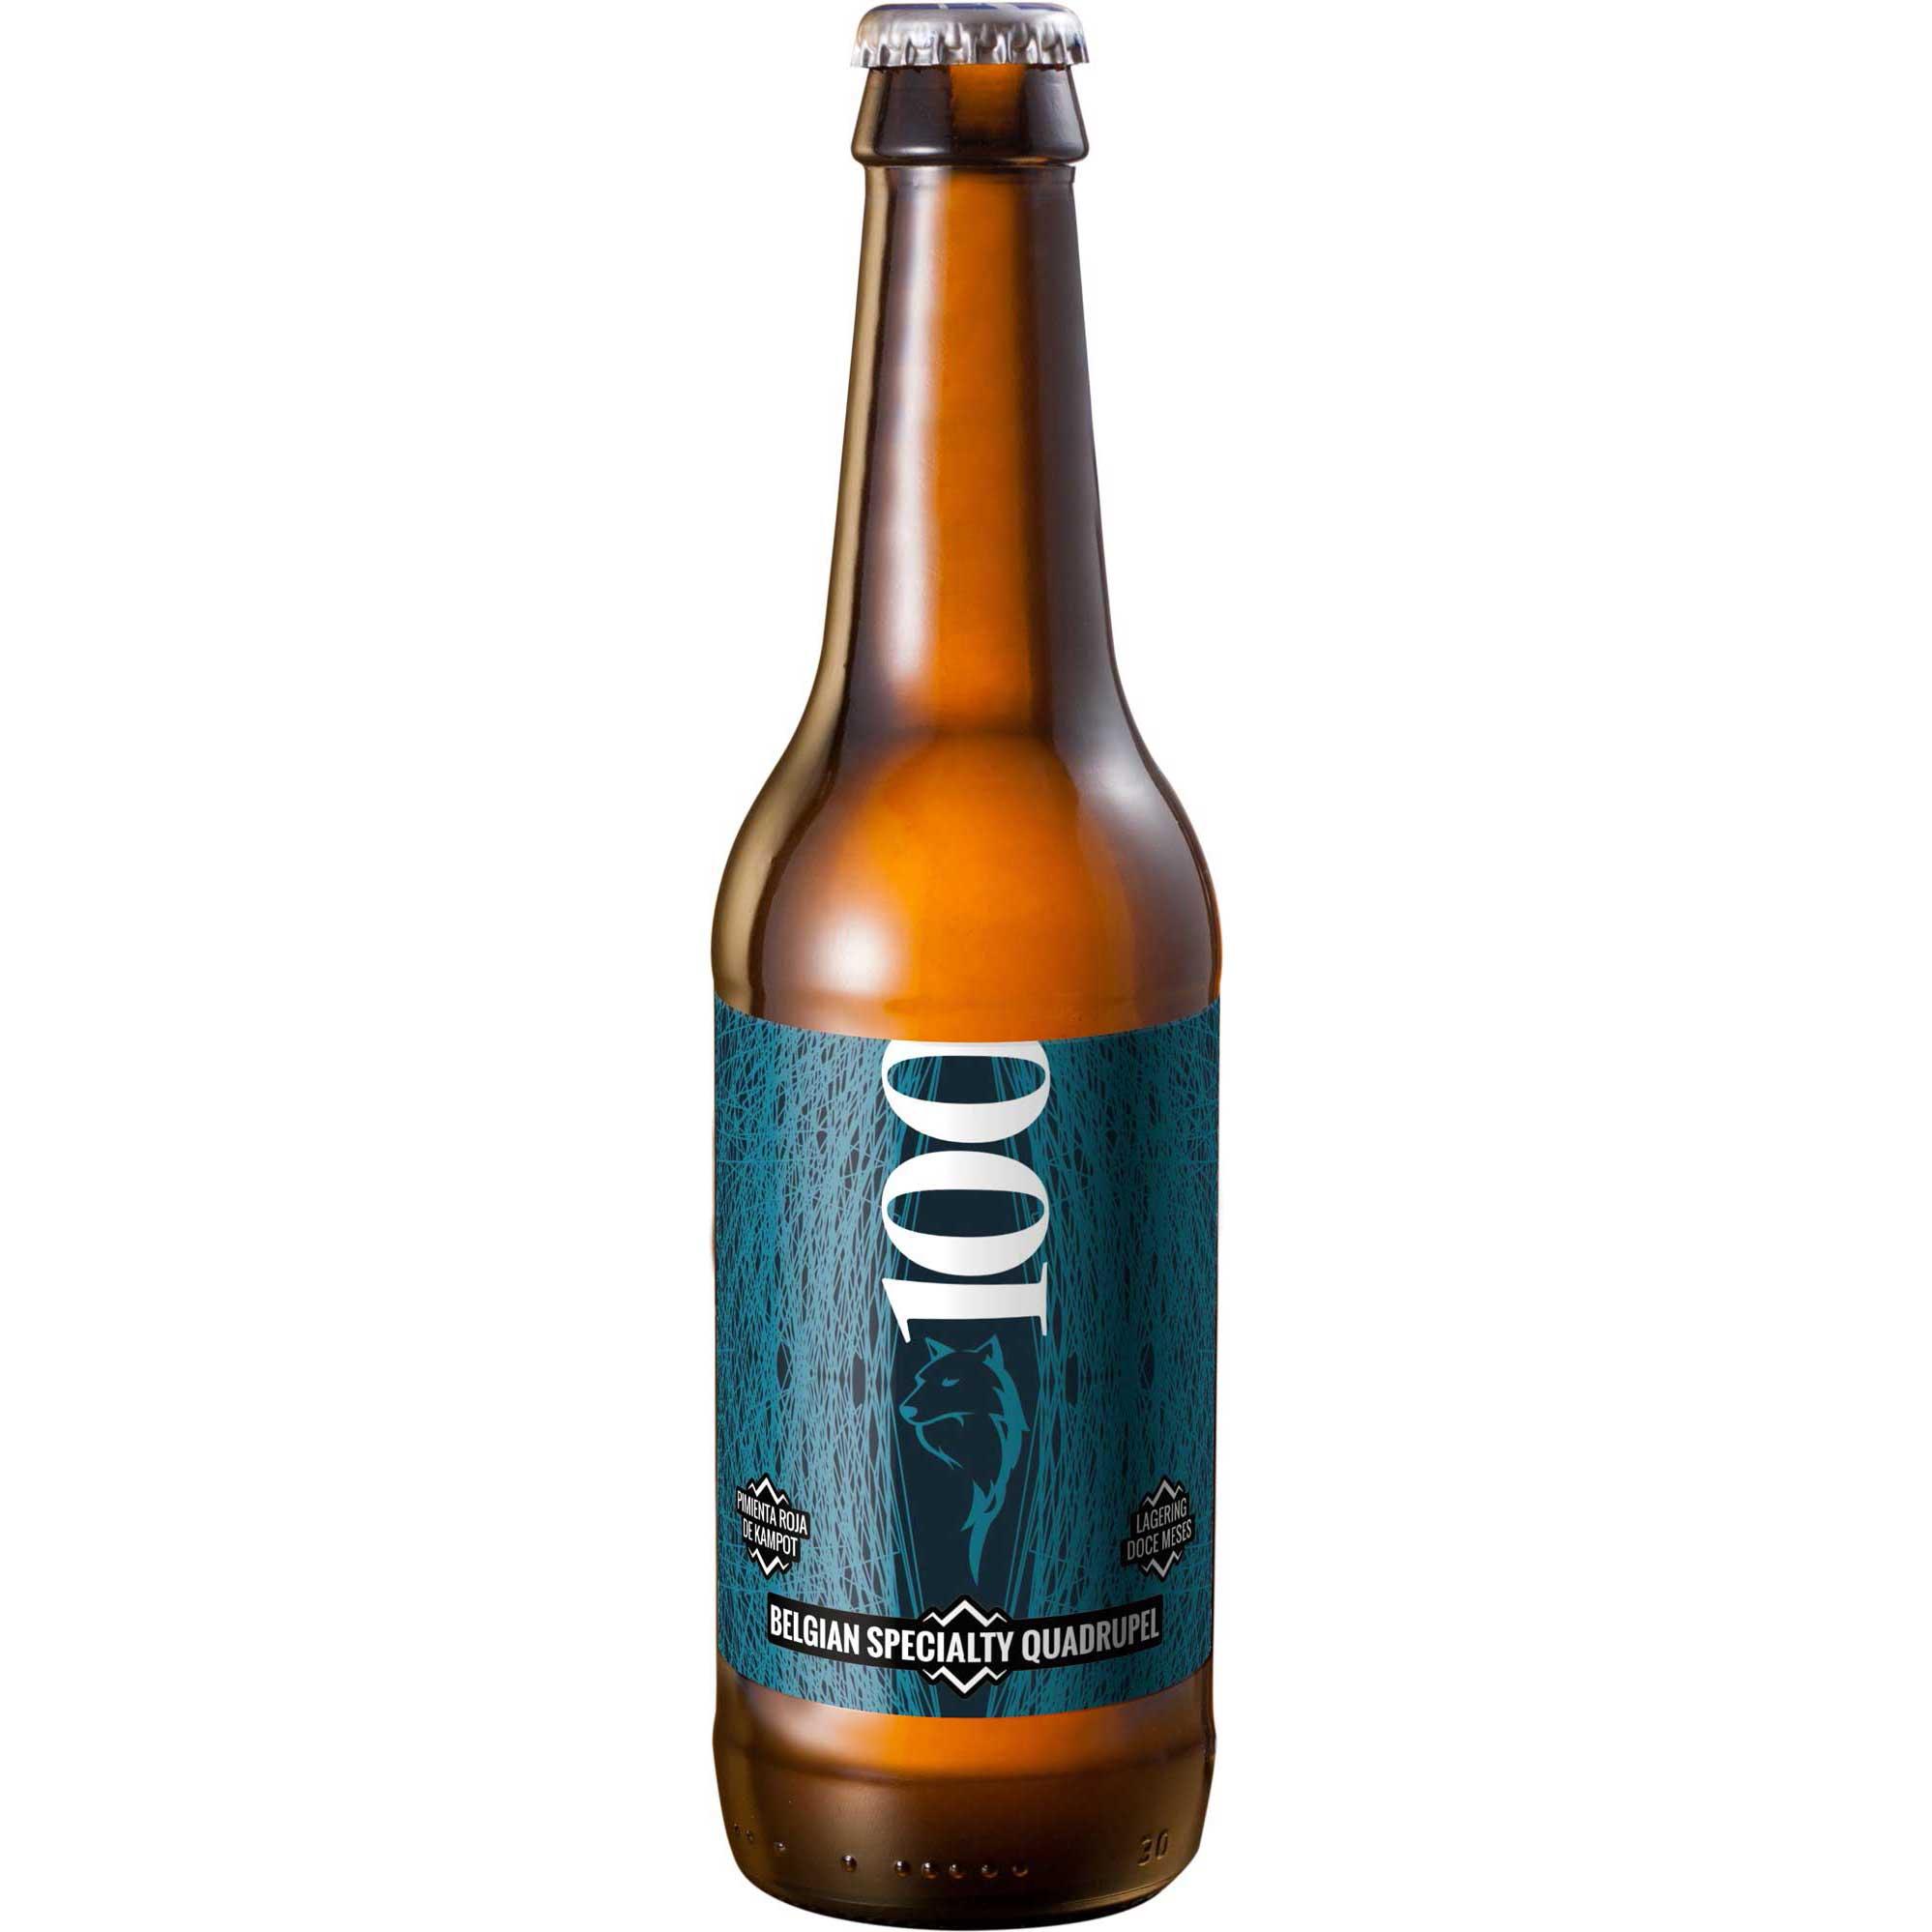 Comprar Cerveza Artesanal Dawat 100.Tipo Belgian Specialty Quadrupel, cerveza negra. Muy alta graduación. Producto gourmet de Cuenca. Delicatessen Castilla-La Mancha.